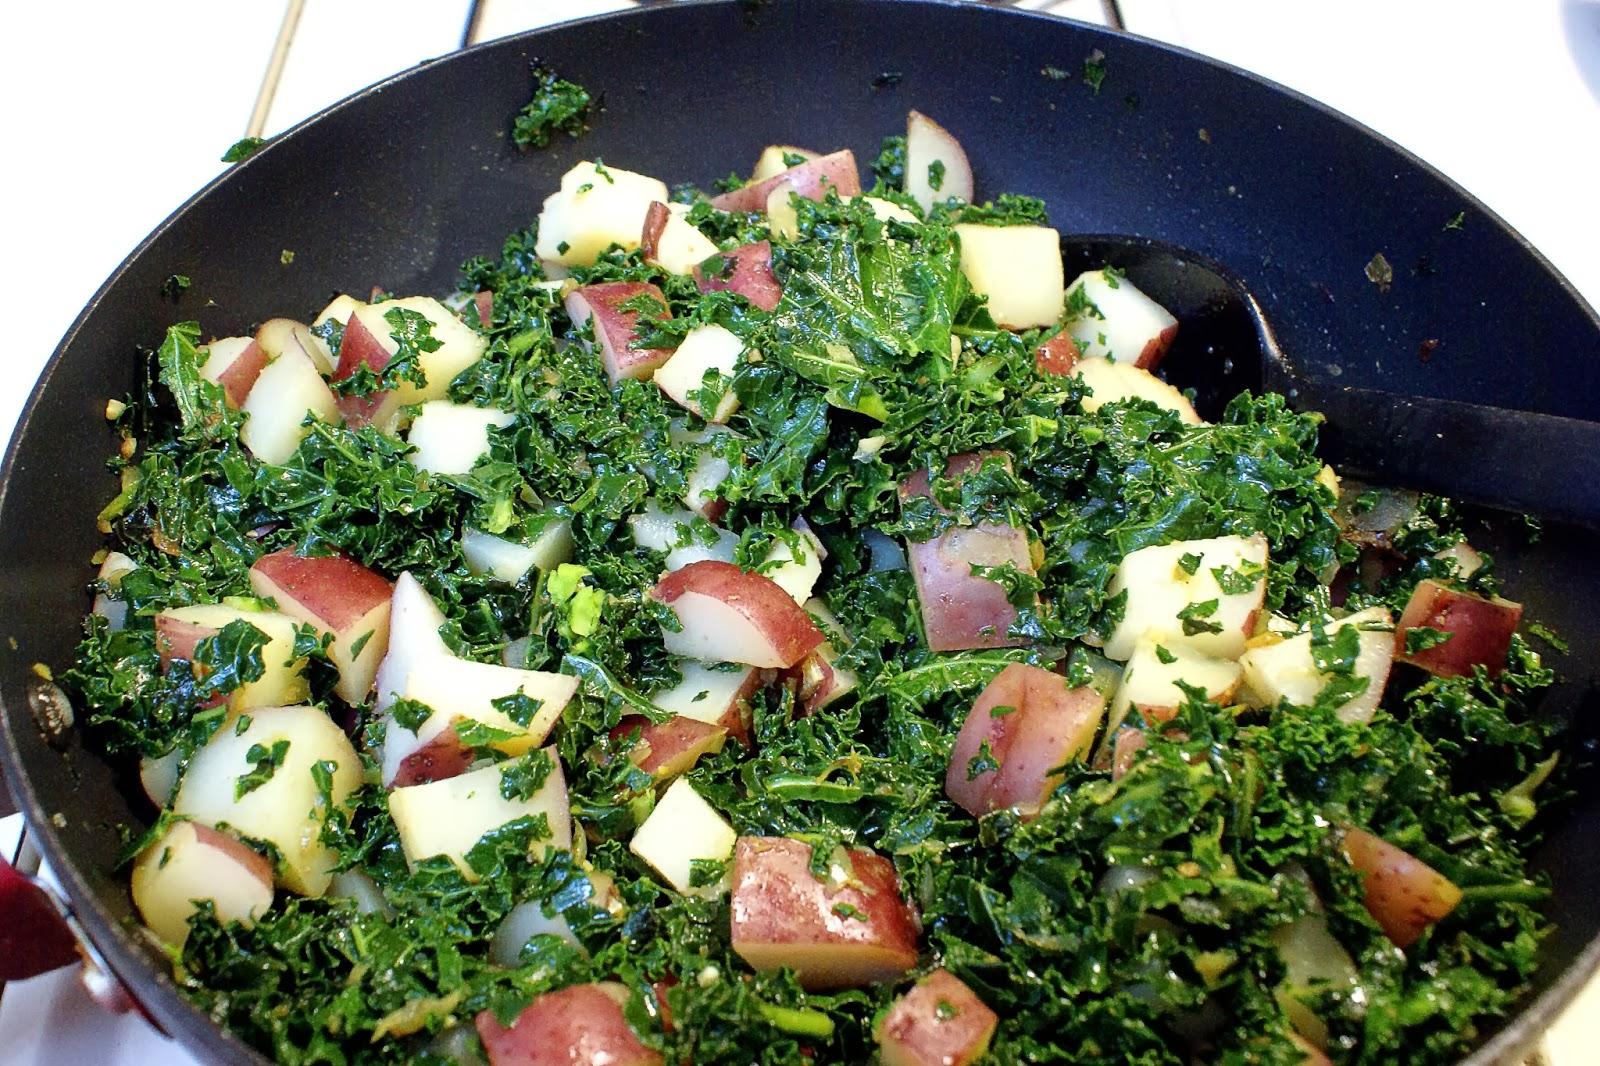 Potato-Kale enchilada filling